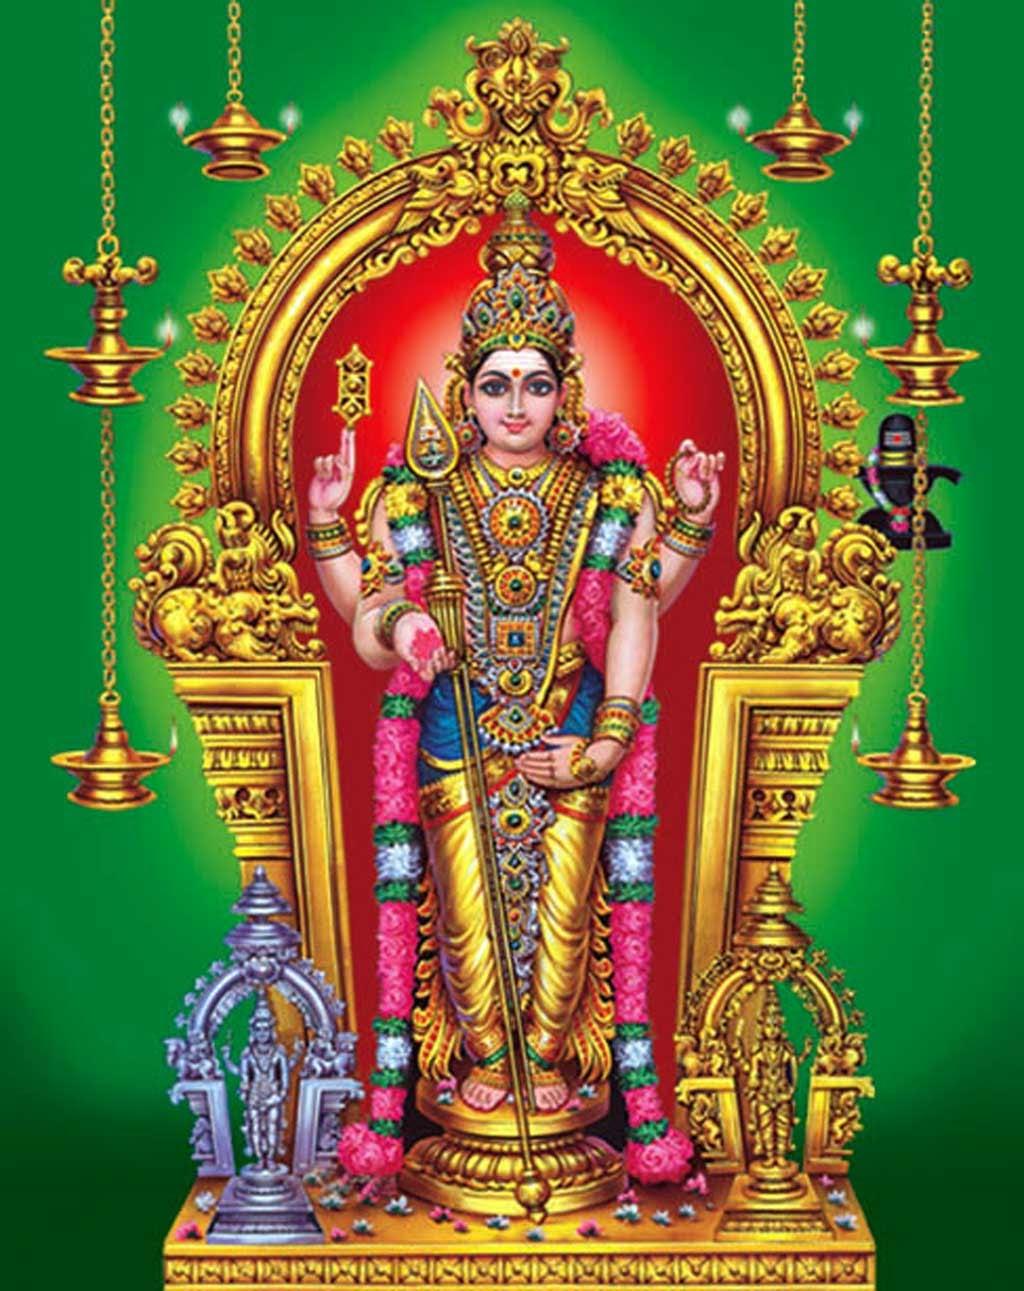 Lord Murugan Wallpapers: Lord Murugan Wallpapers